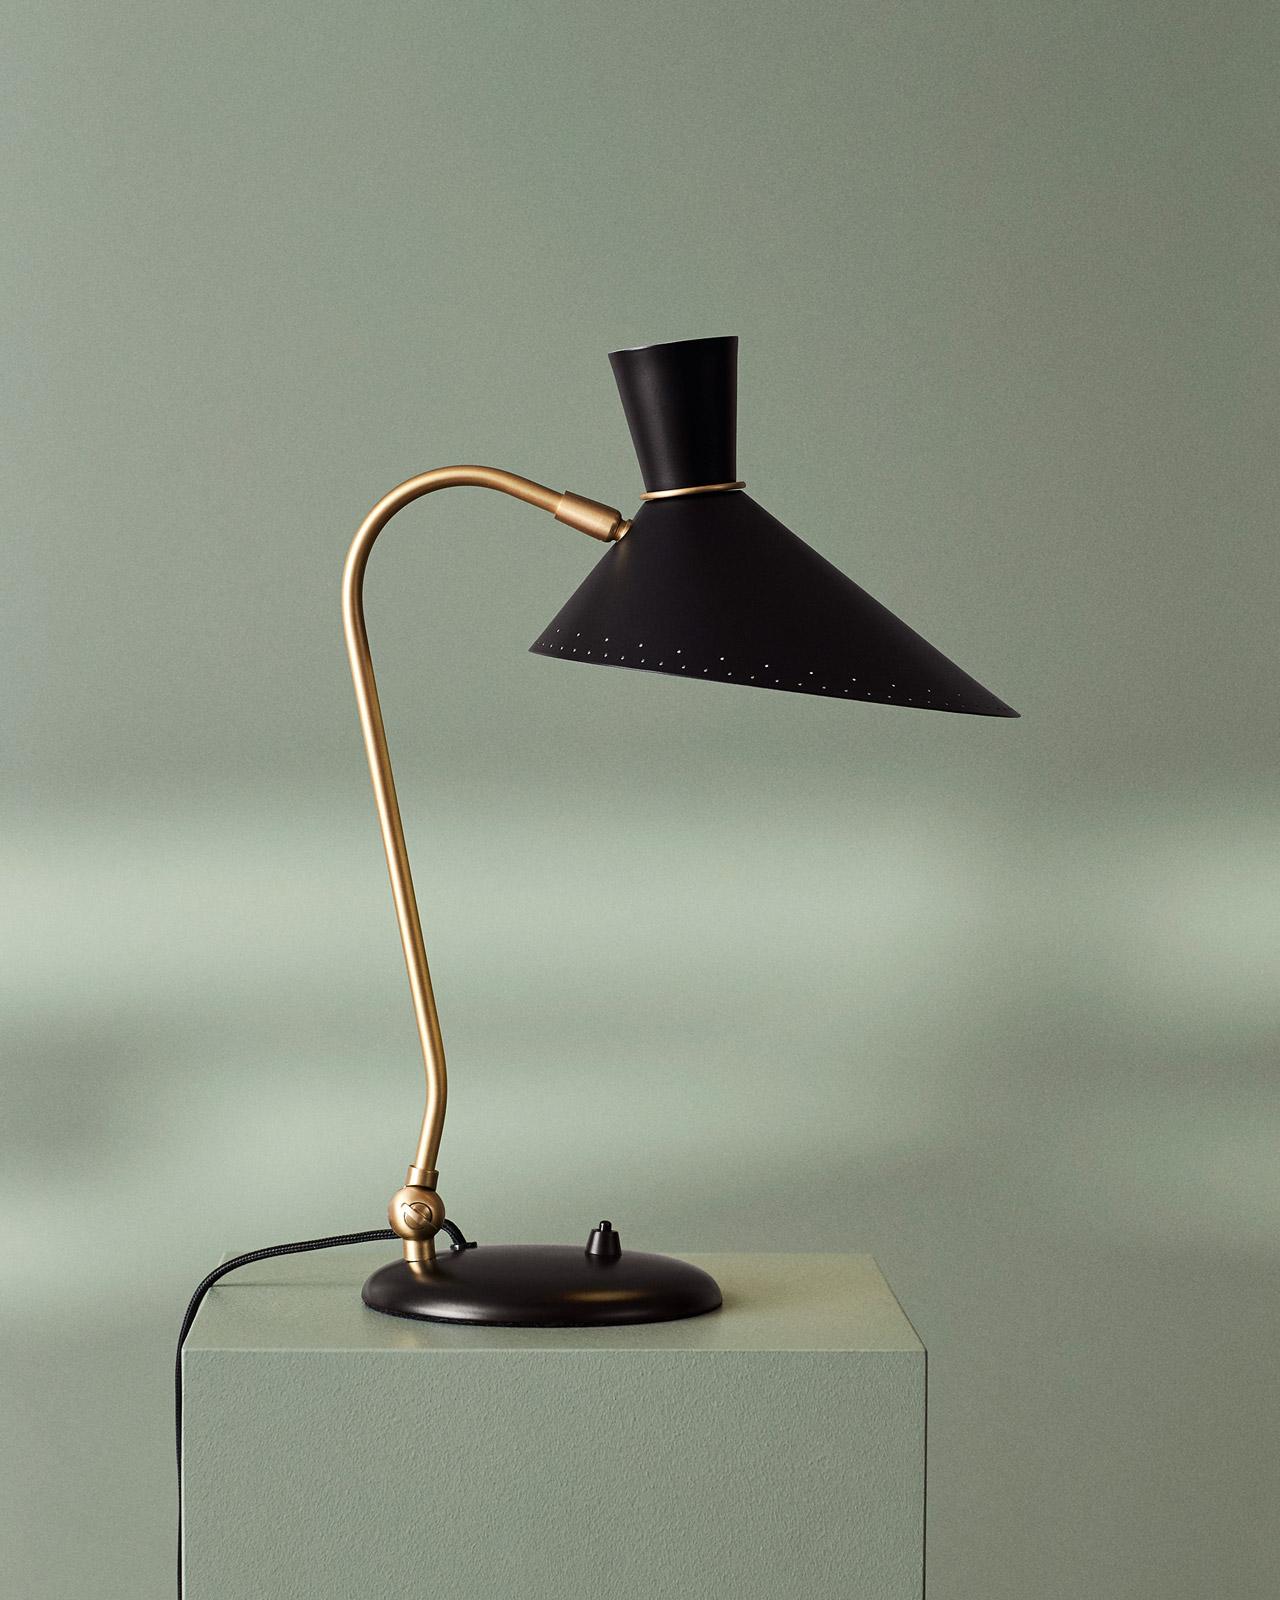 Nordic lighting Bathroom Warm Nordic Bloom Table Lamp In Black Noir Originally Designed In 1950 By Svend Aage Holmsørensen Chinahaocom Warm Nordic Lighting Mid Mod More